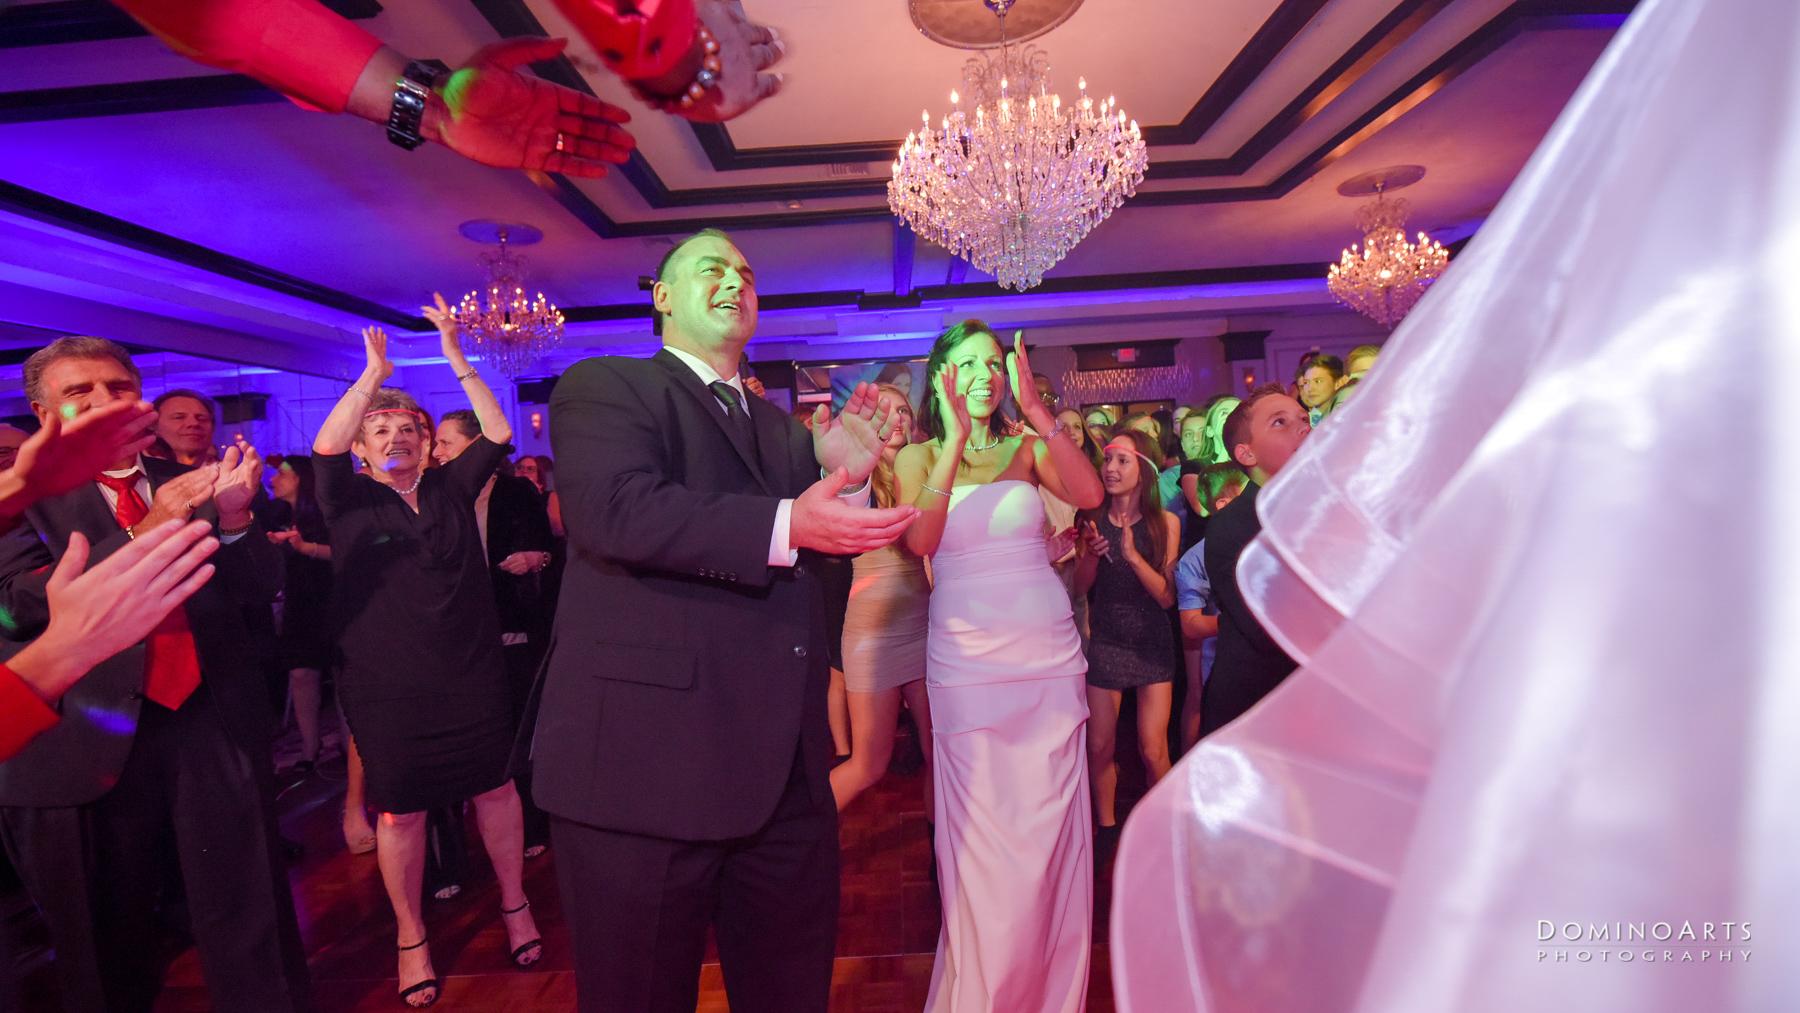 Fun dancing party pictures at Temple Beth El Mitzvah, Boca Raton Mitzvah